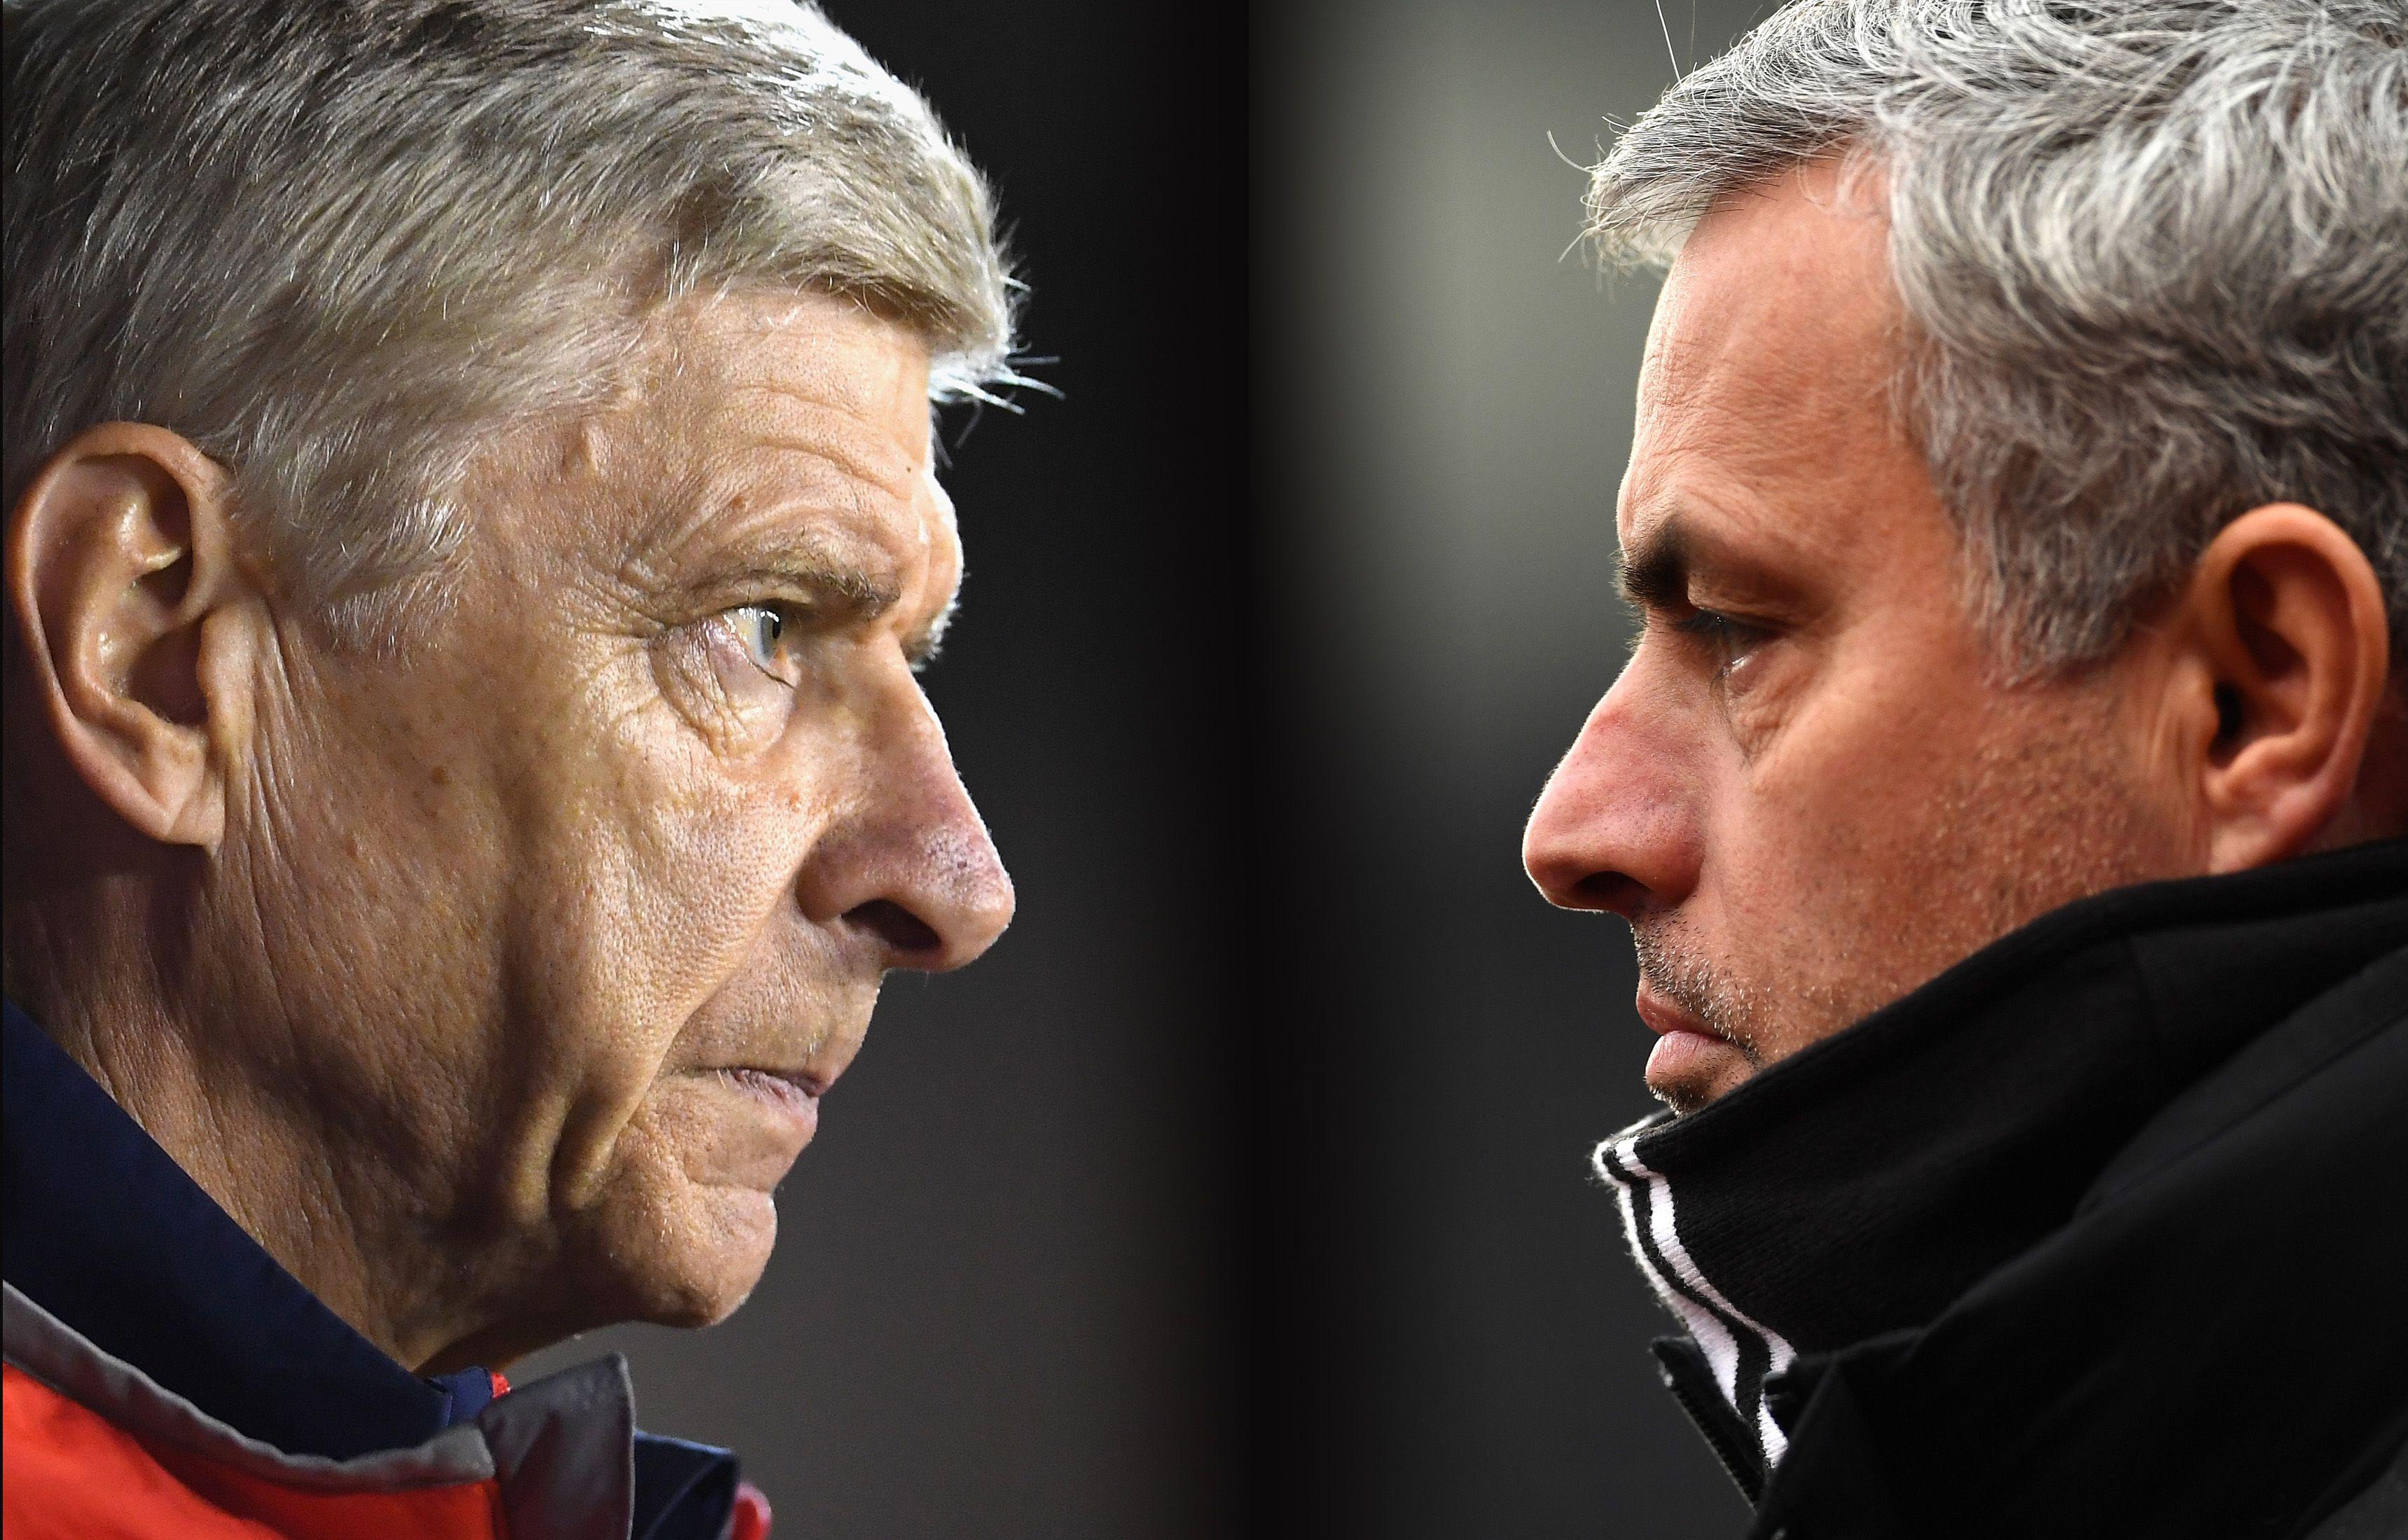 Arsenal or Manchester United should have signed Jermain Defoe, says Glenn Hoddle